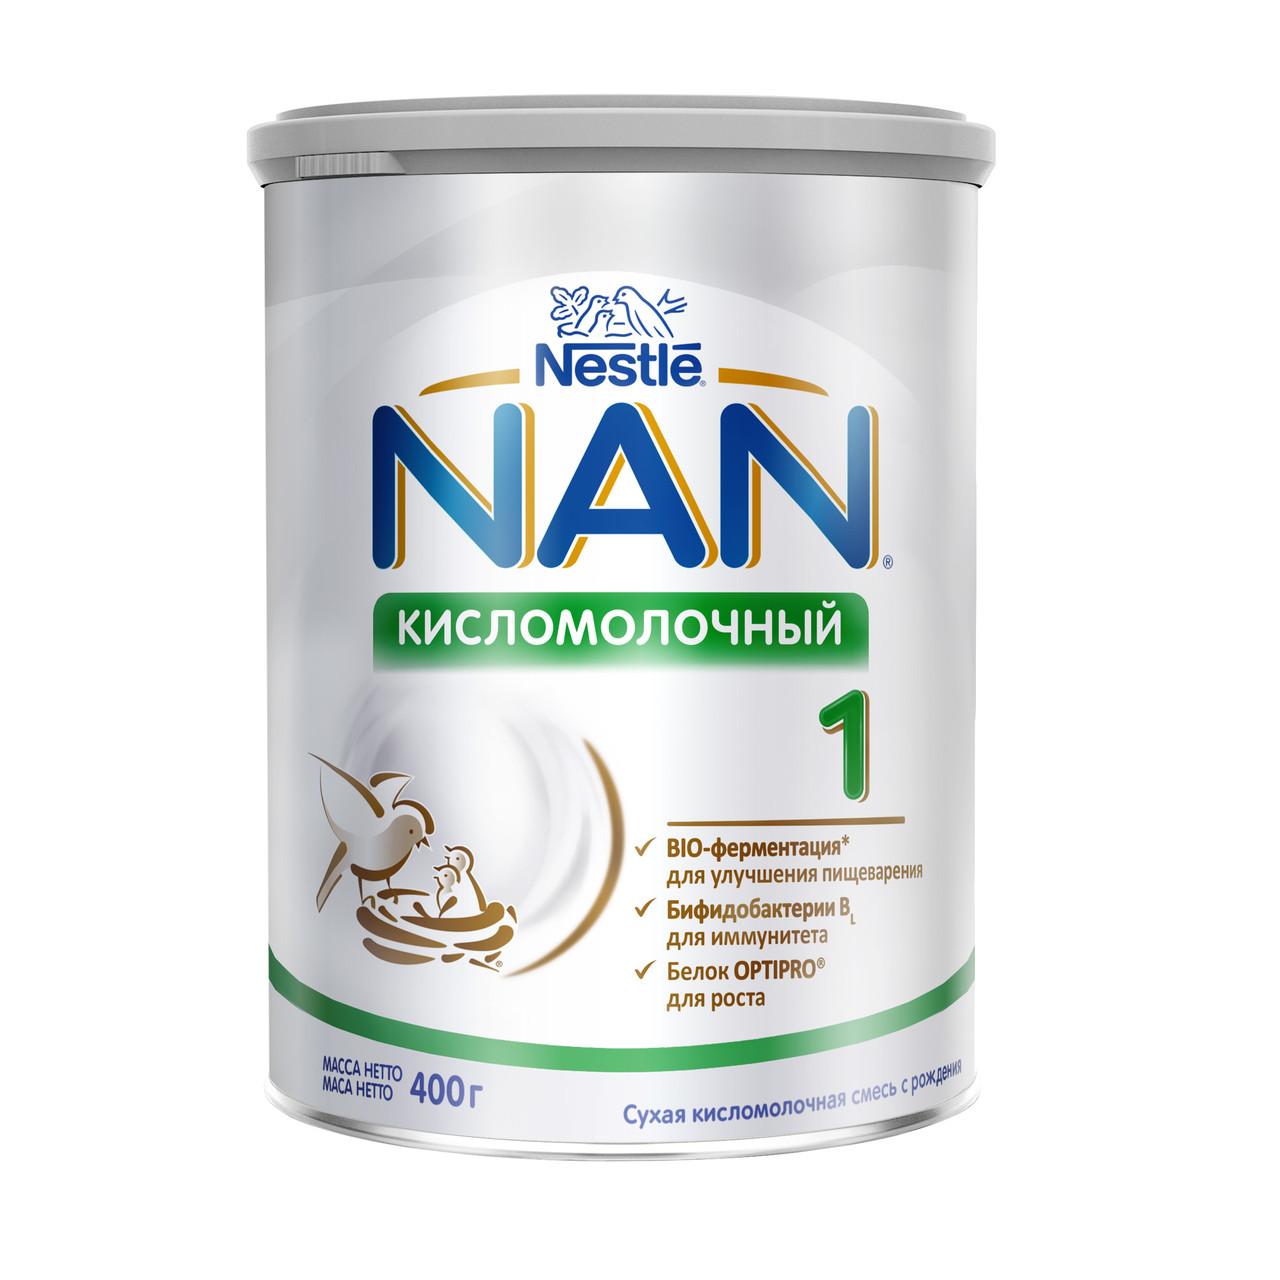 NAN (НАН) КИСЛОМОЛОЧНИЙ 1, 400 г сухая молочная смесь